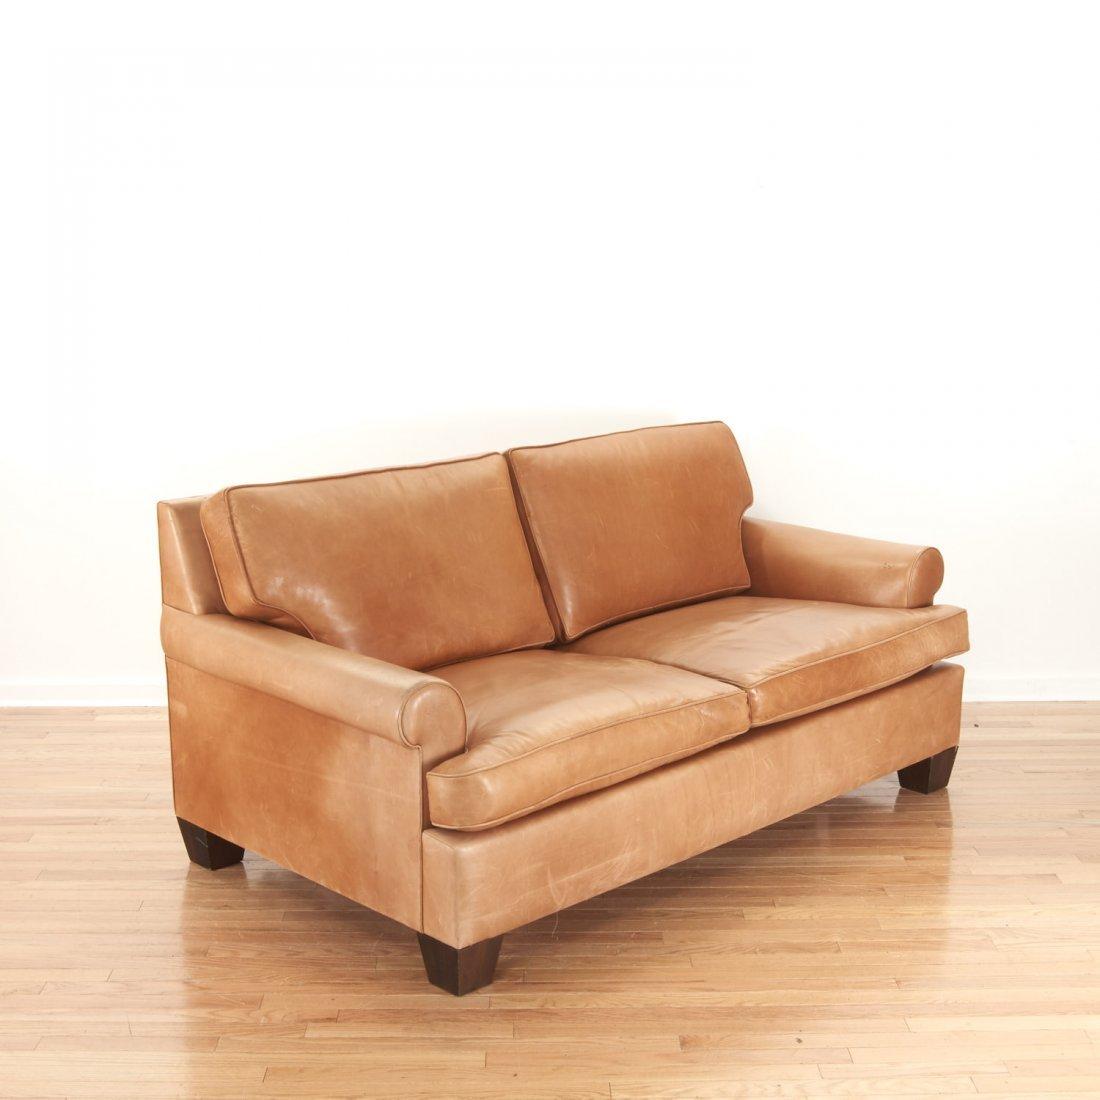 Nice Borge Mogensen style leather sleeper sofa - 2